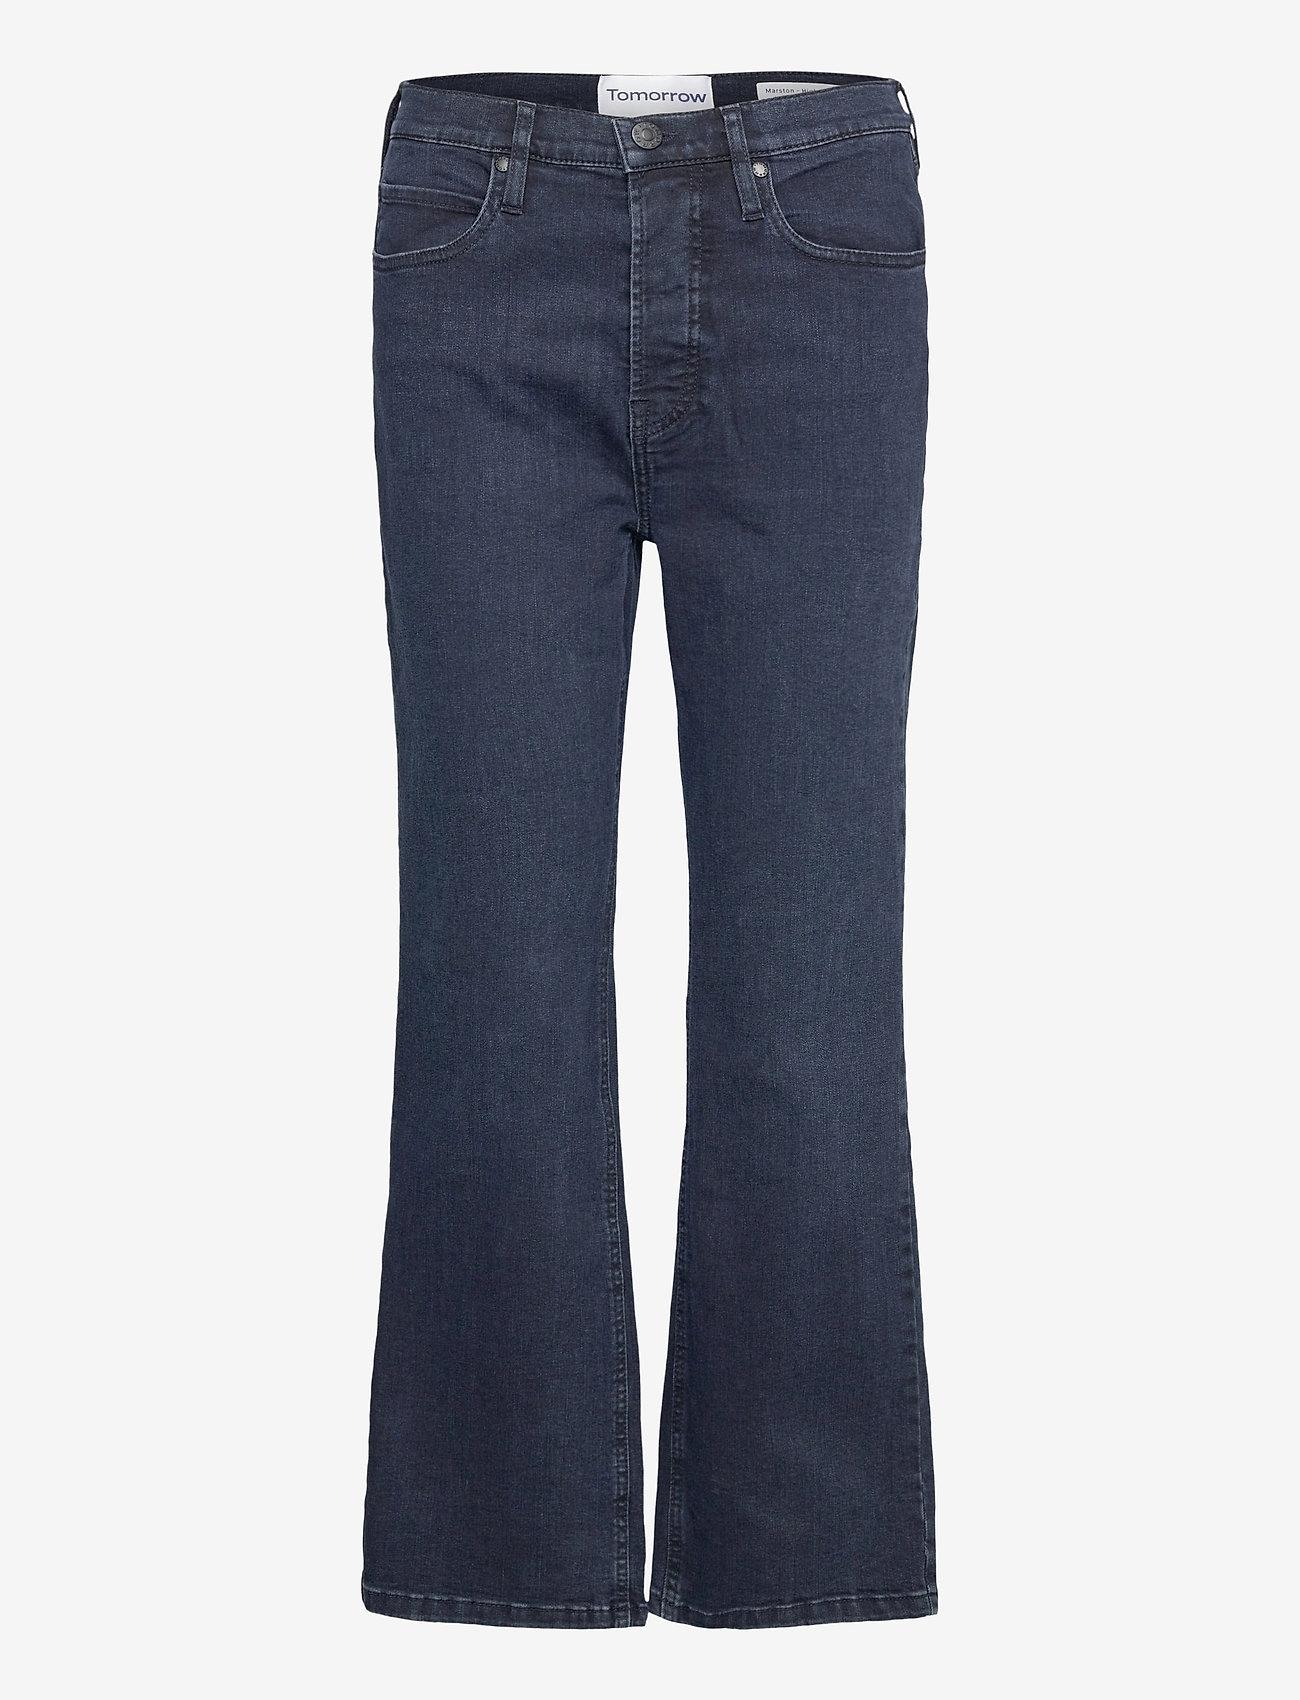 Tomorrow - Marston jeans wash Austin - schlaghosen - denim blue - 0